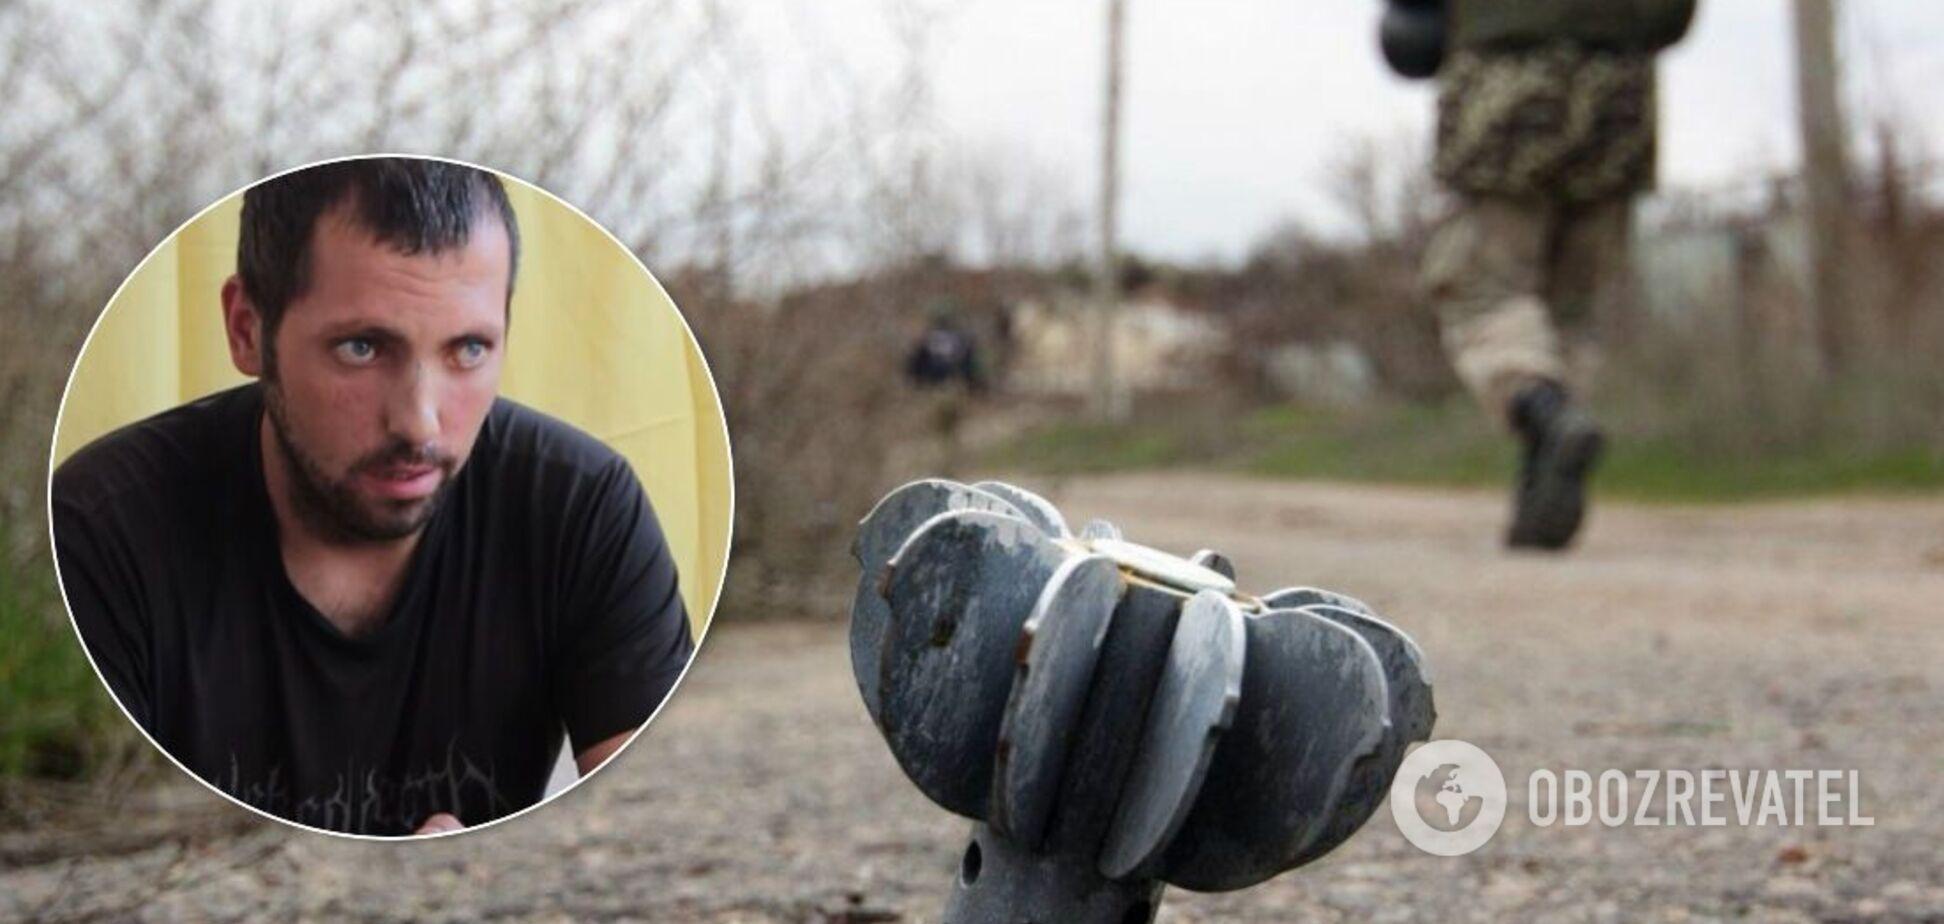 Снайпер рассказал правду о террористах на Донбассе